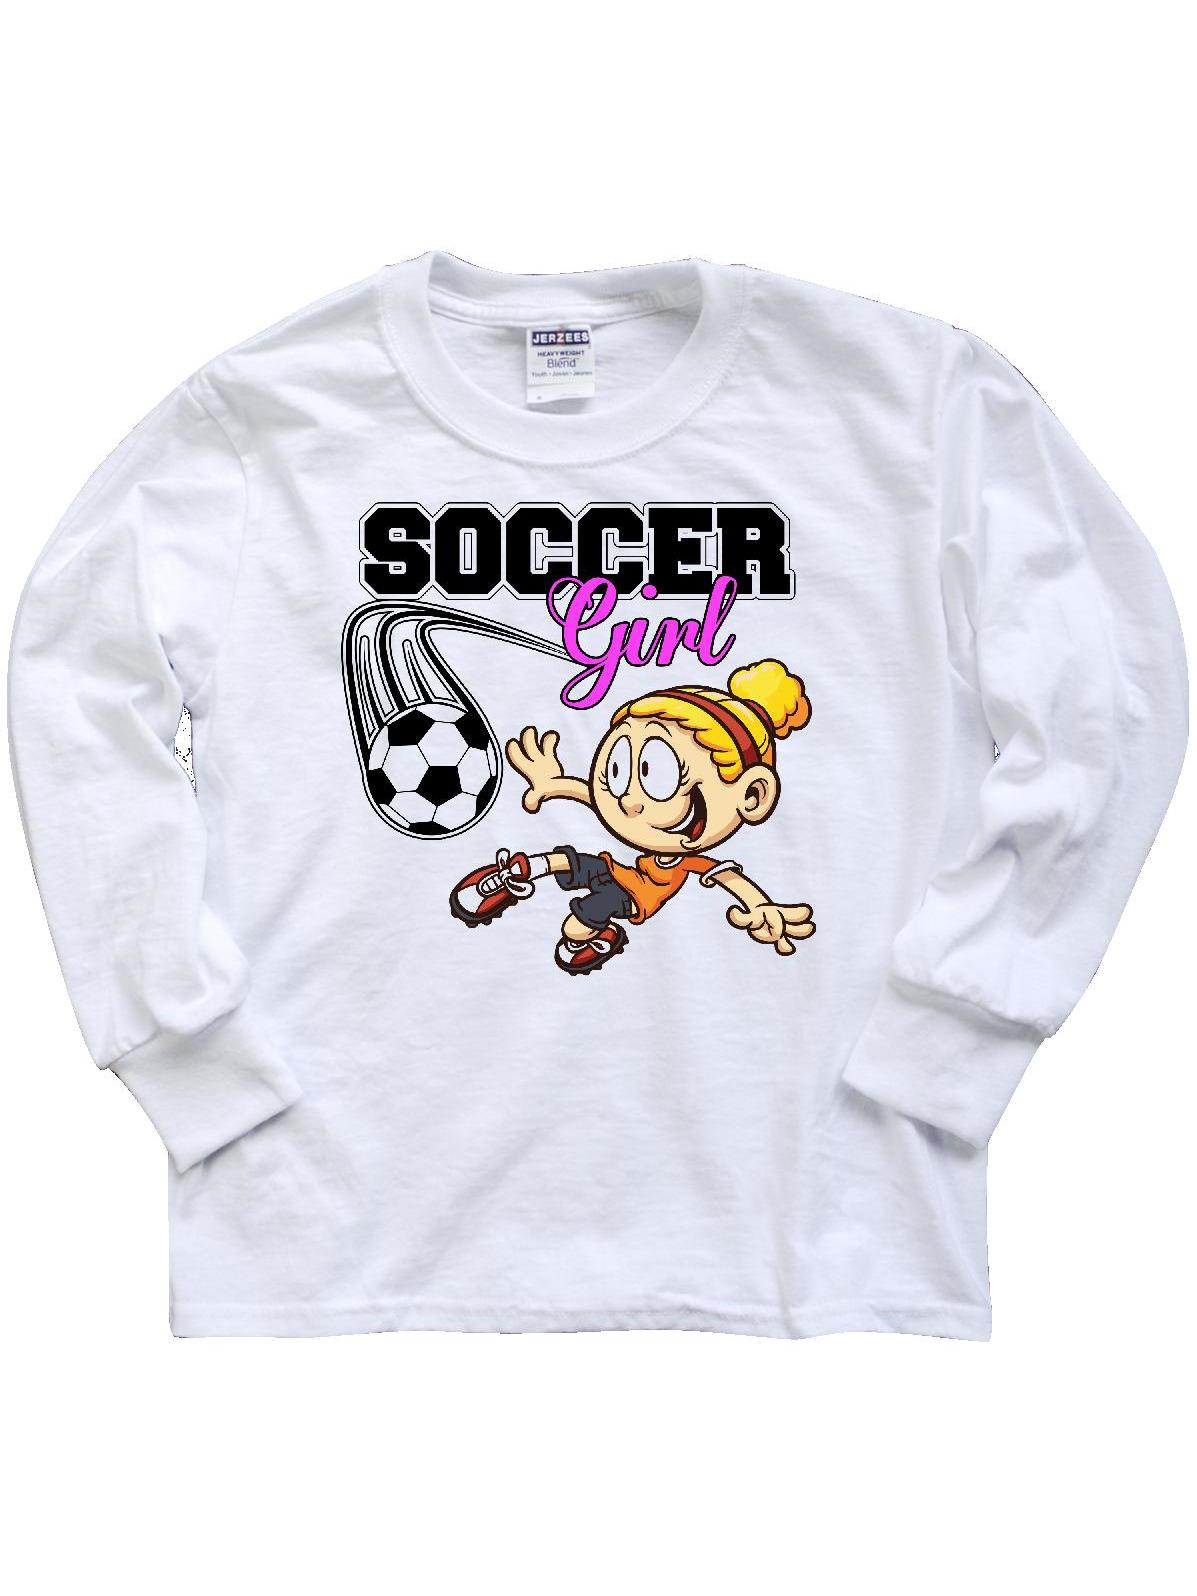 Soccer Girl Youth Long Sleeve T-Shirt